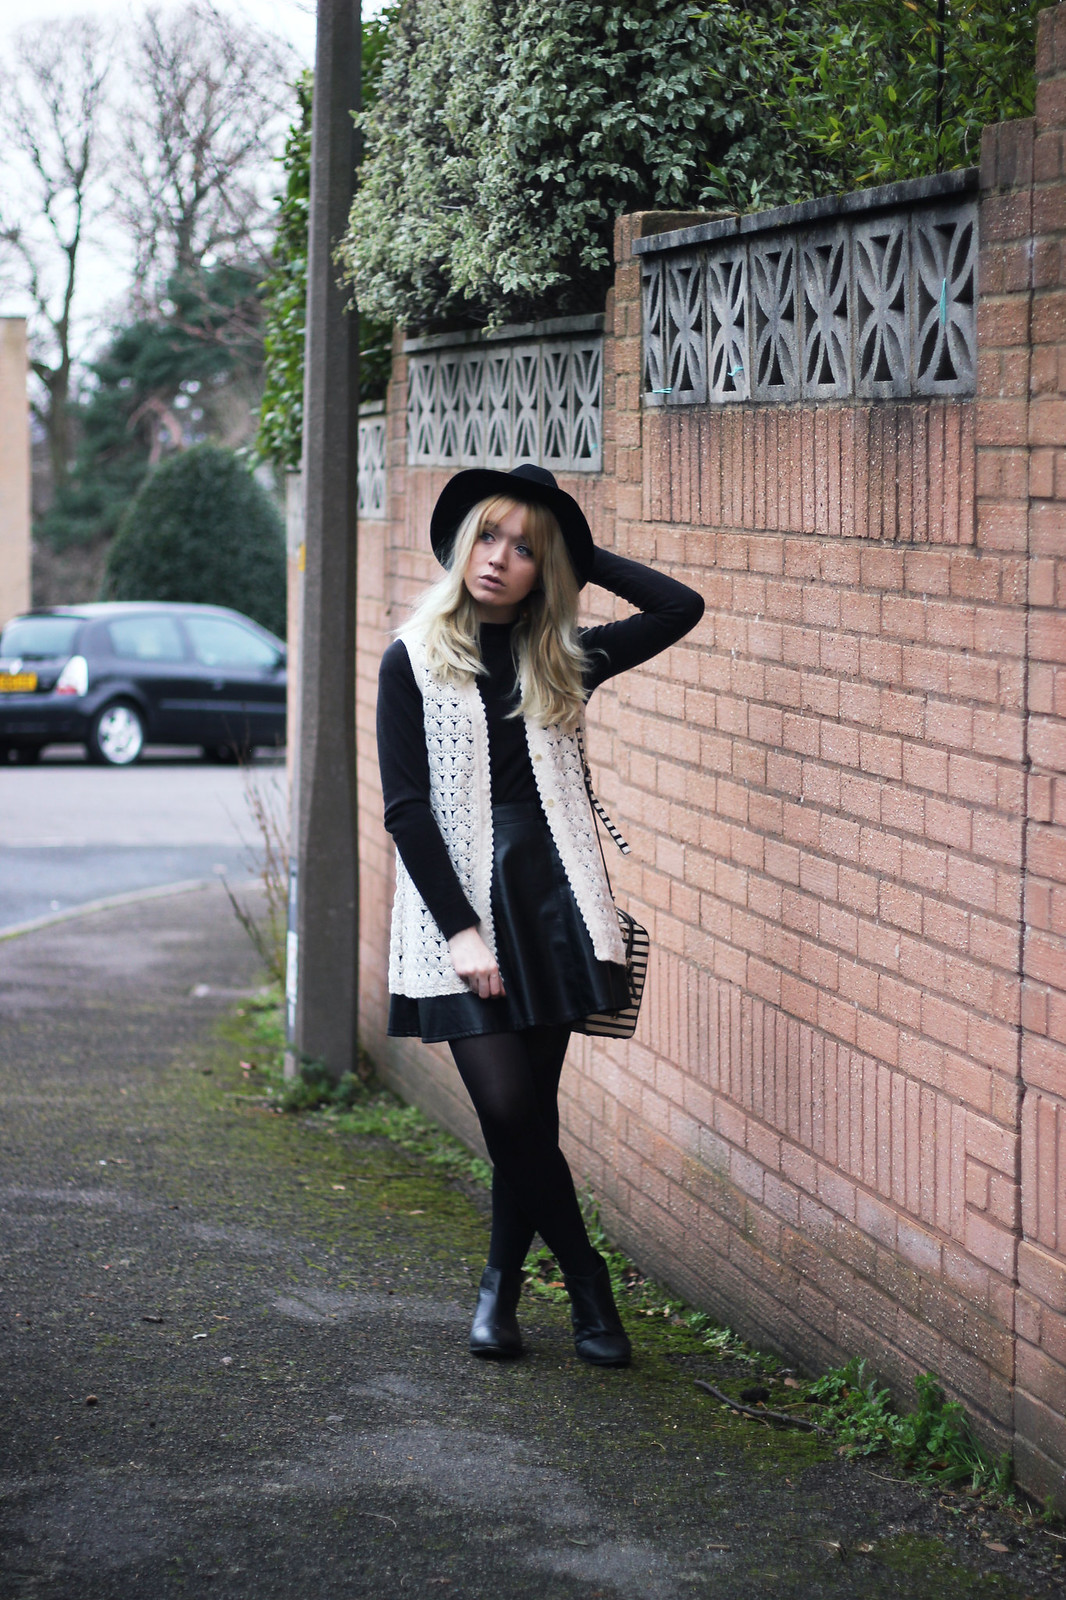 1-crochet-waistcoat-outfit, fashion-blogger-style, boho, mod